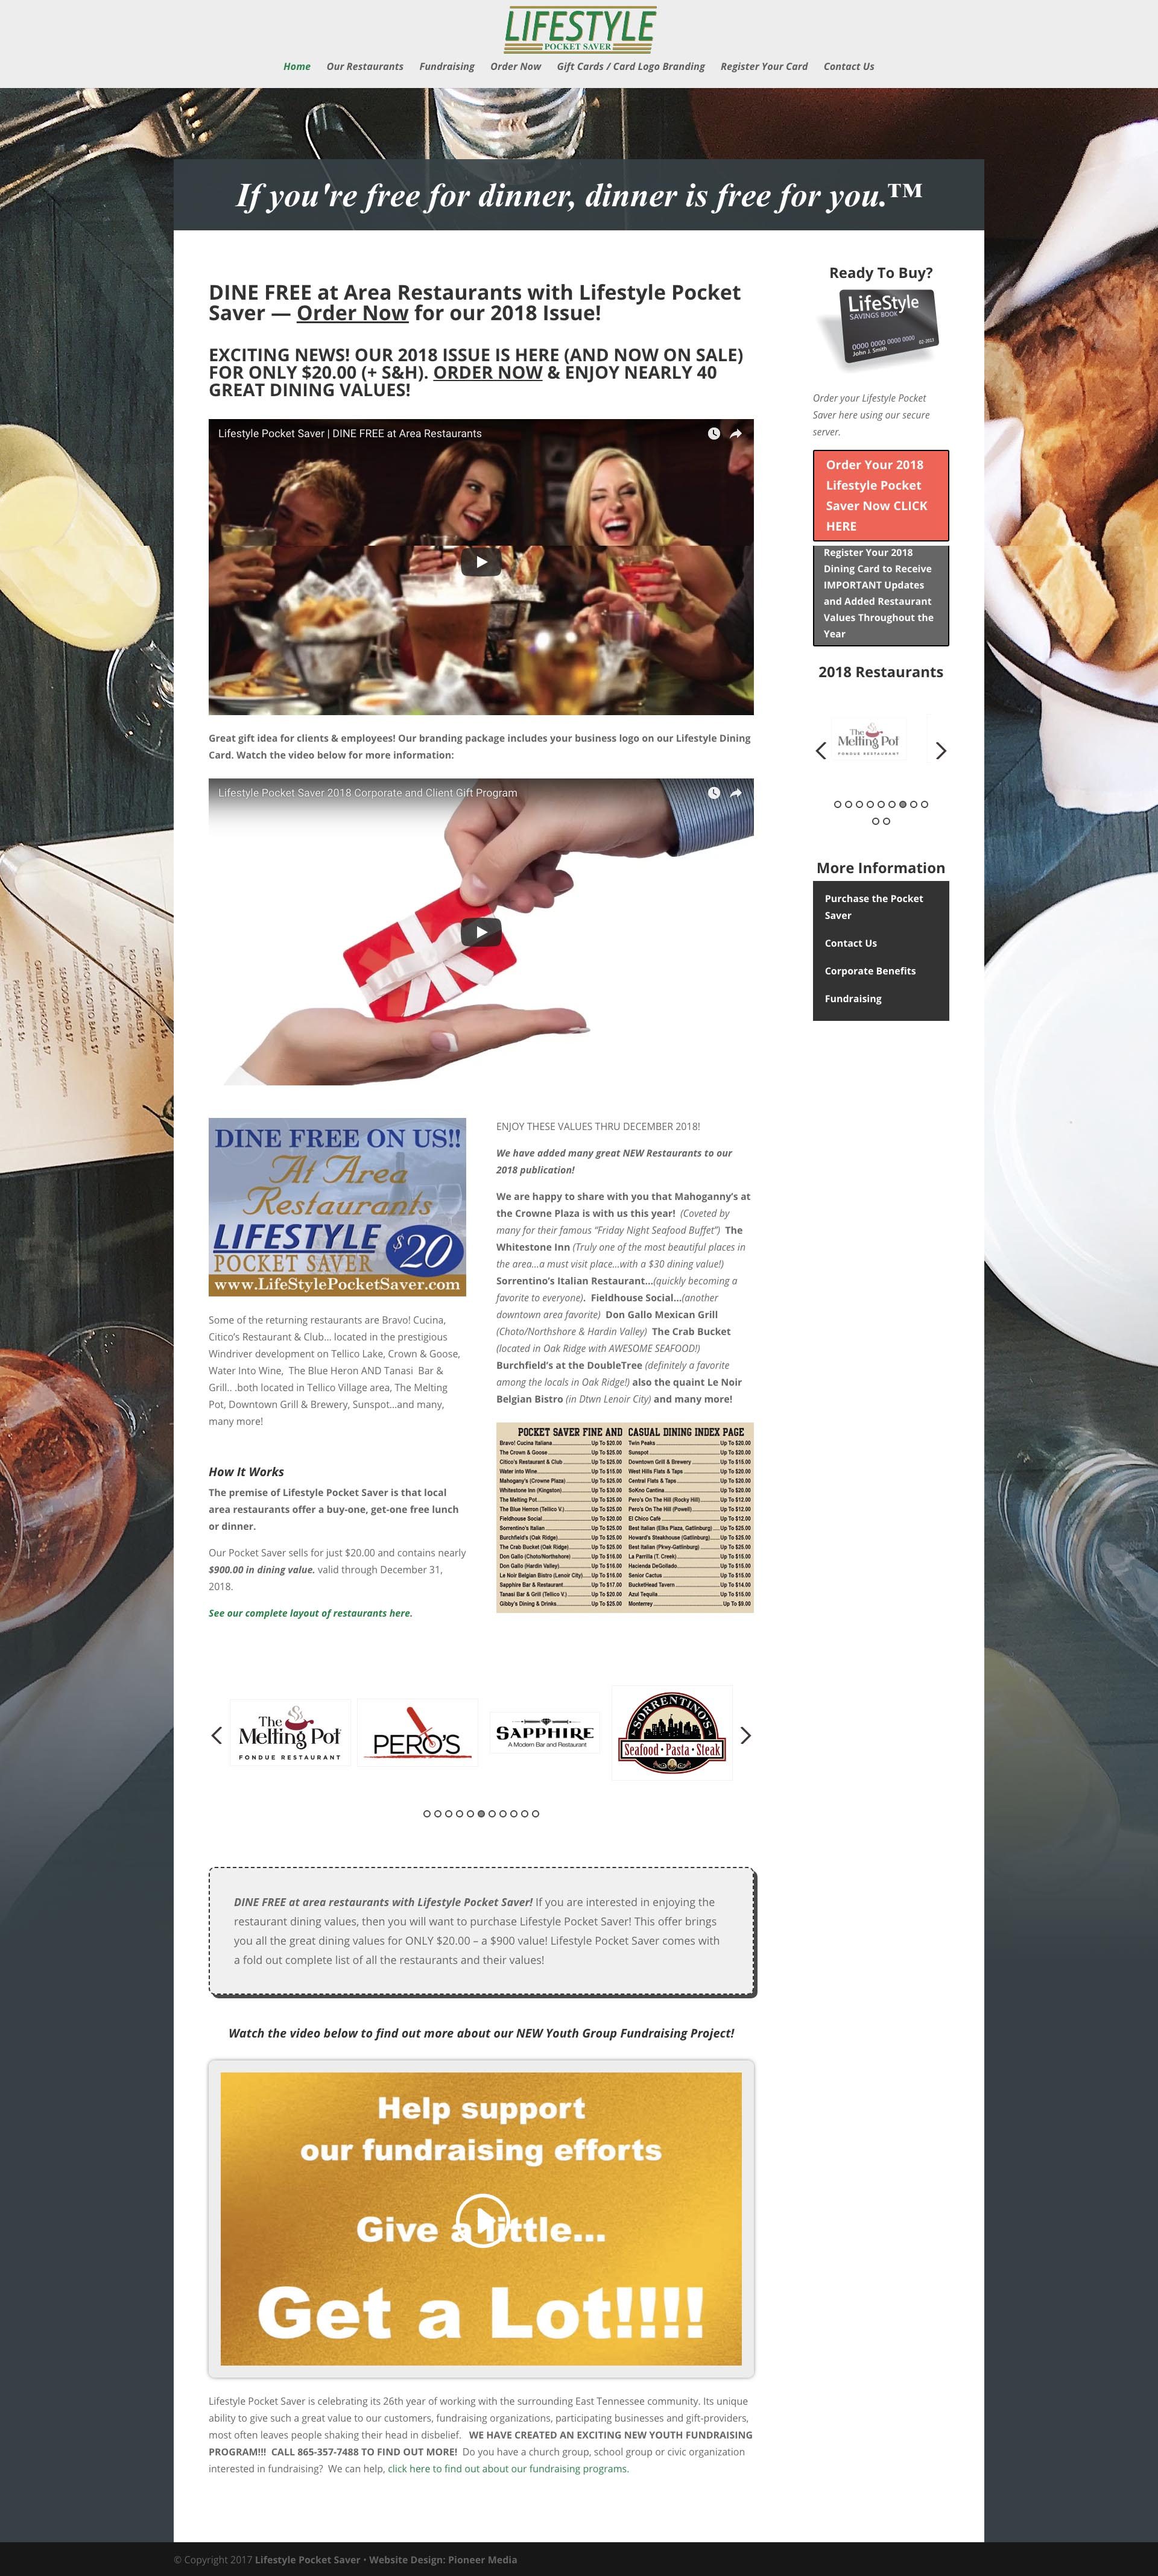 Lifestyle Pocket Saver Homepage Screenshot